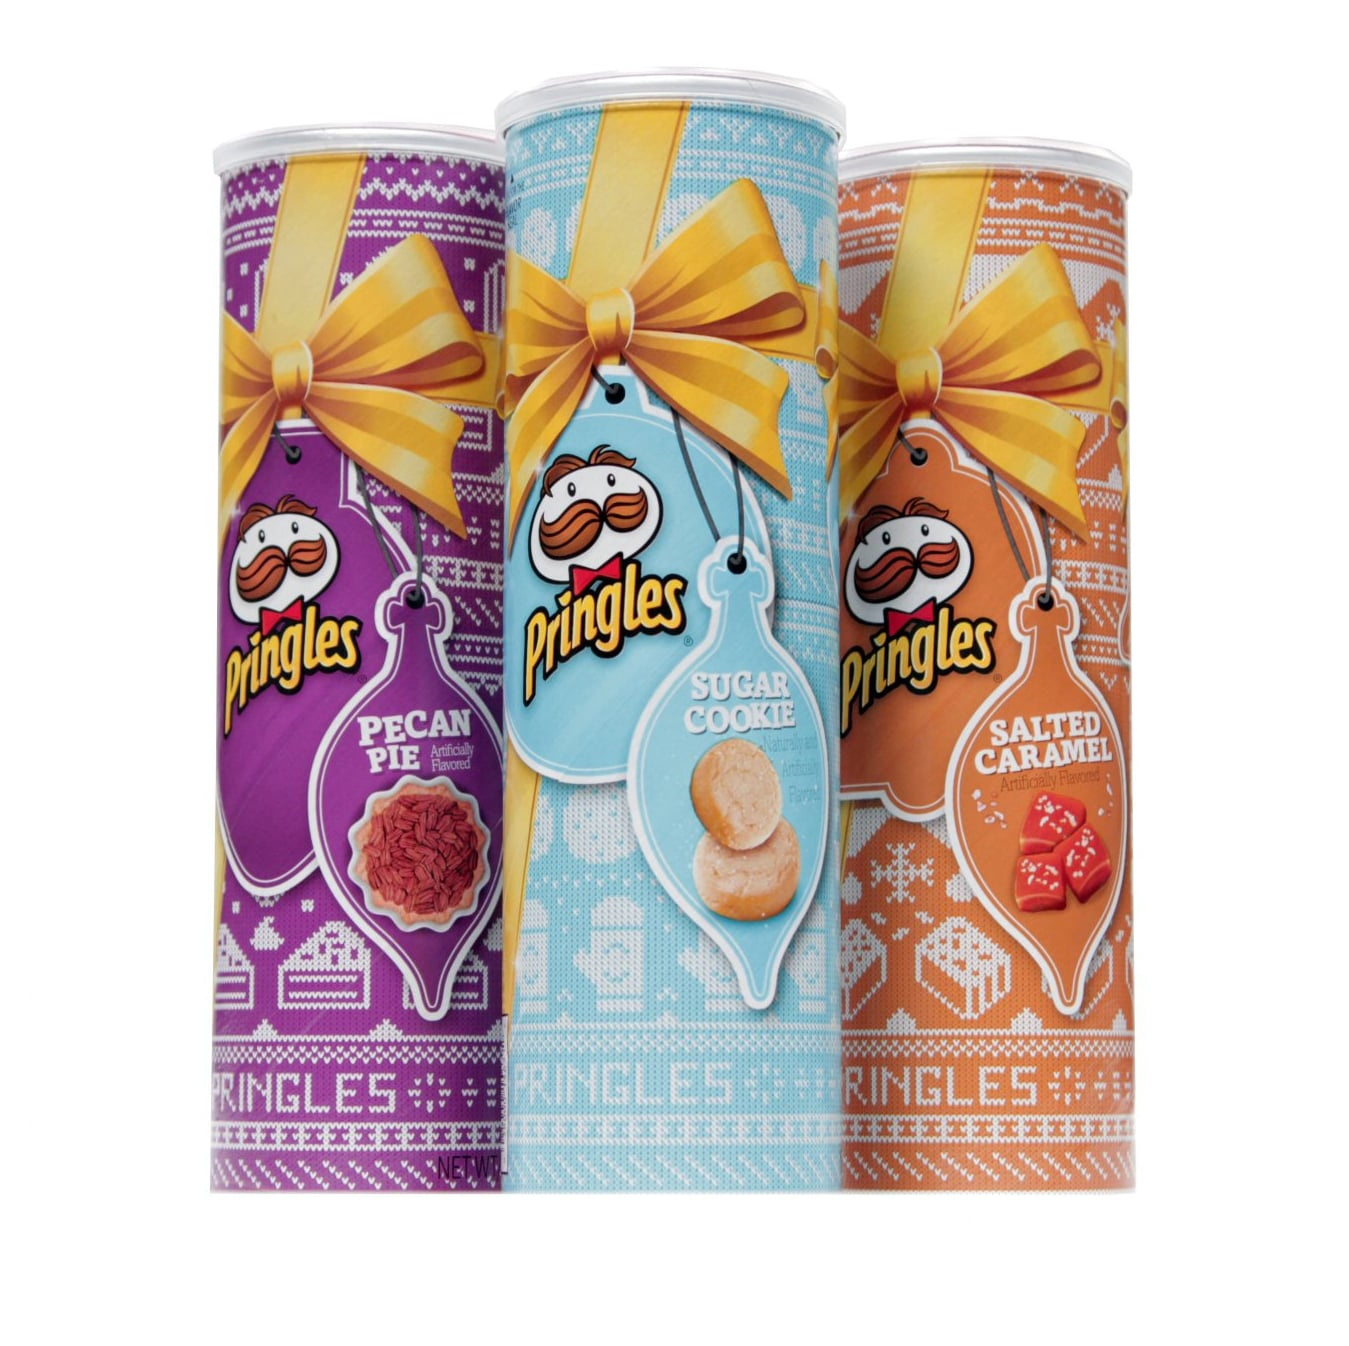 Pringles Holiday Flavors 2016